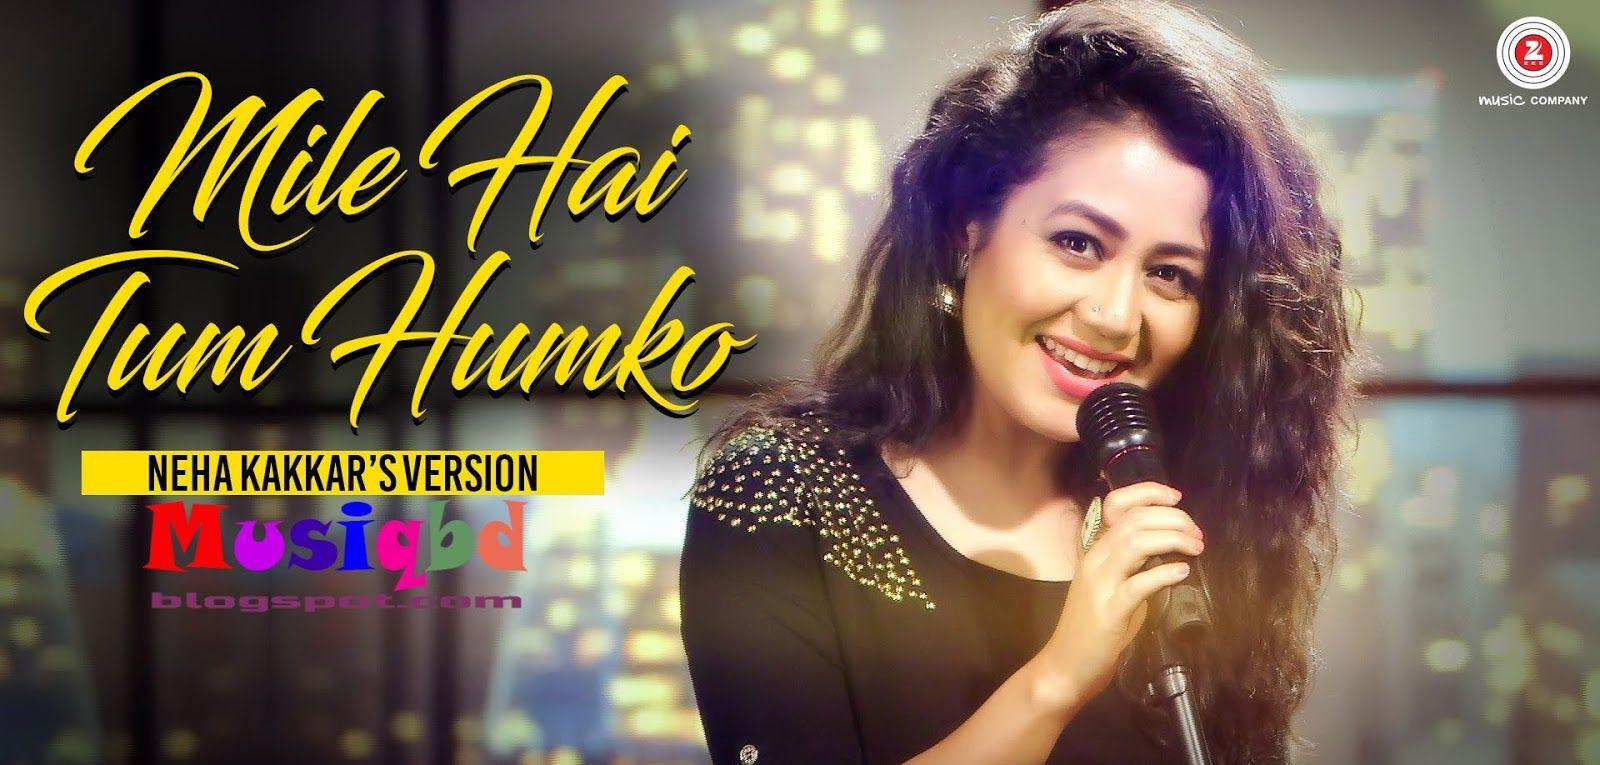 Mile Ho Tum Cover By Neha Kakkar Tony Kakkar Fever 2016 Bollywood Movie Mp3 Song Download Mp3 Song Download Mp3 Song Romantic Song Lyrics